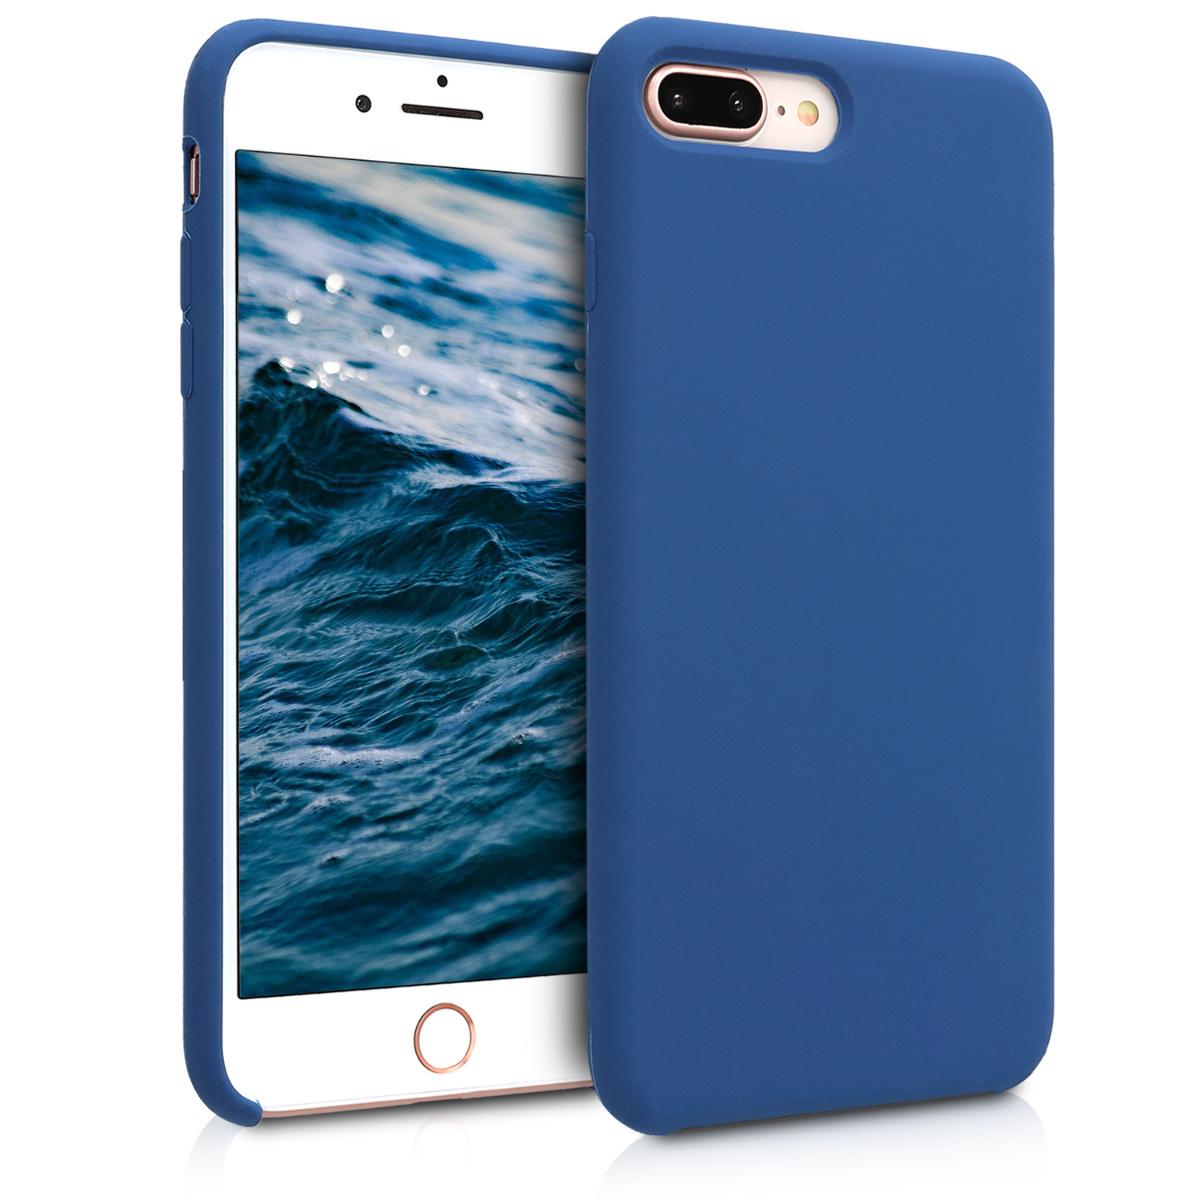 KW Soft Flexible Rubber Θήκη Σιλικόνης iPhone 7 Plus / 8 Plus - Navy Blue (40842.116)